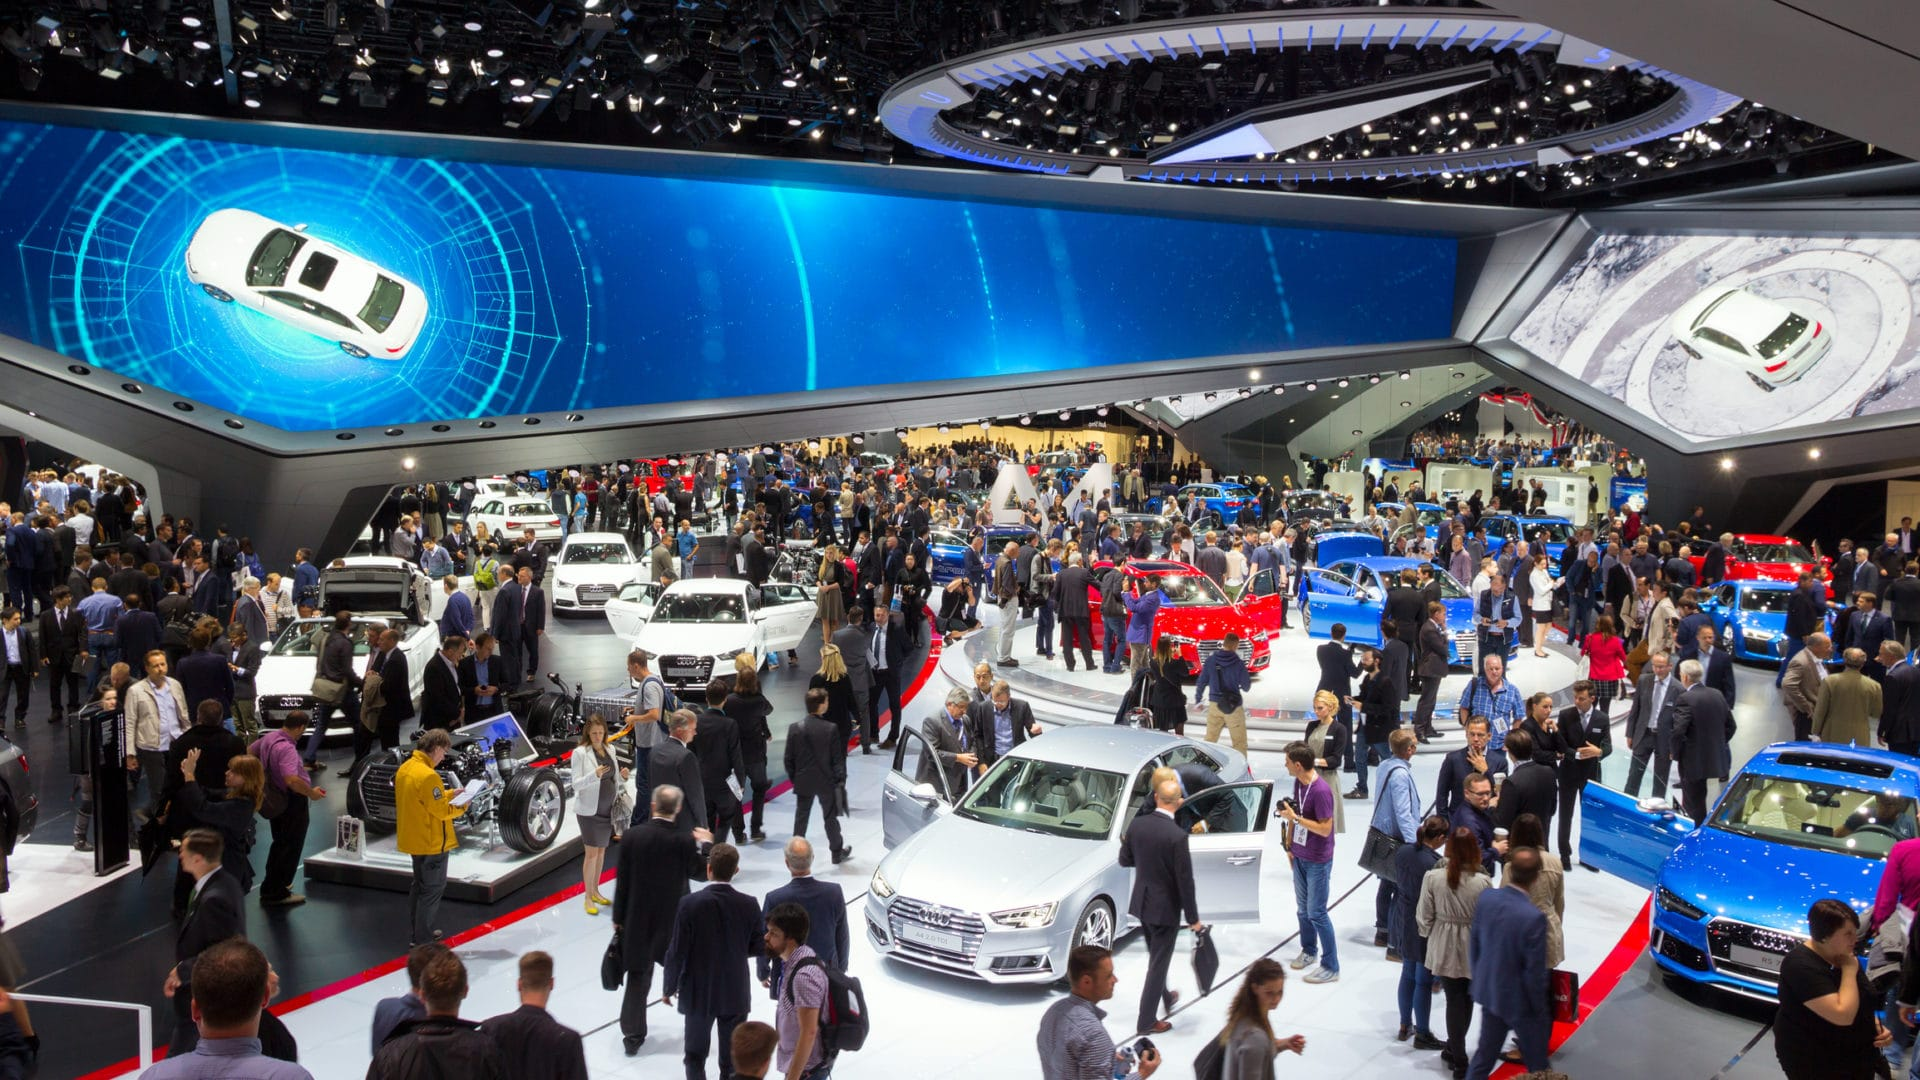 Franfurt Auto Show